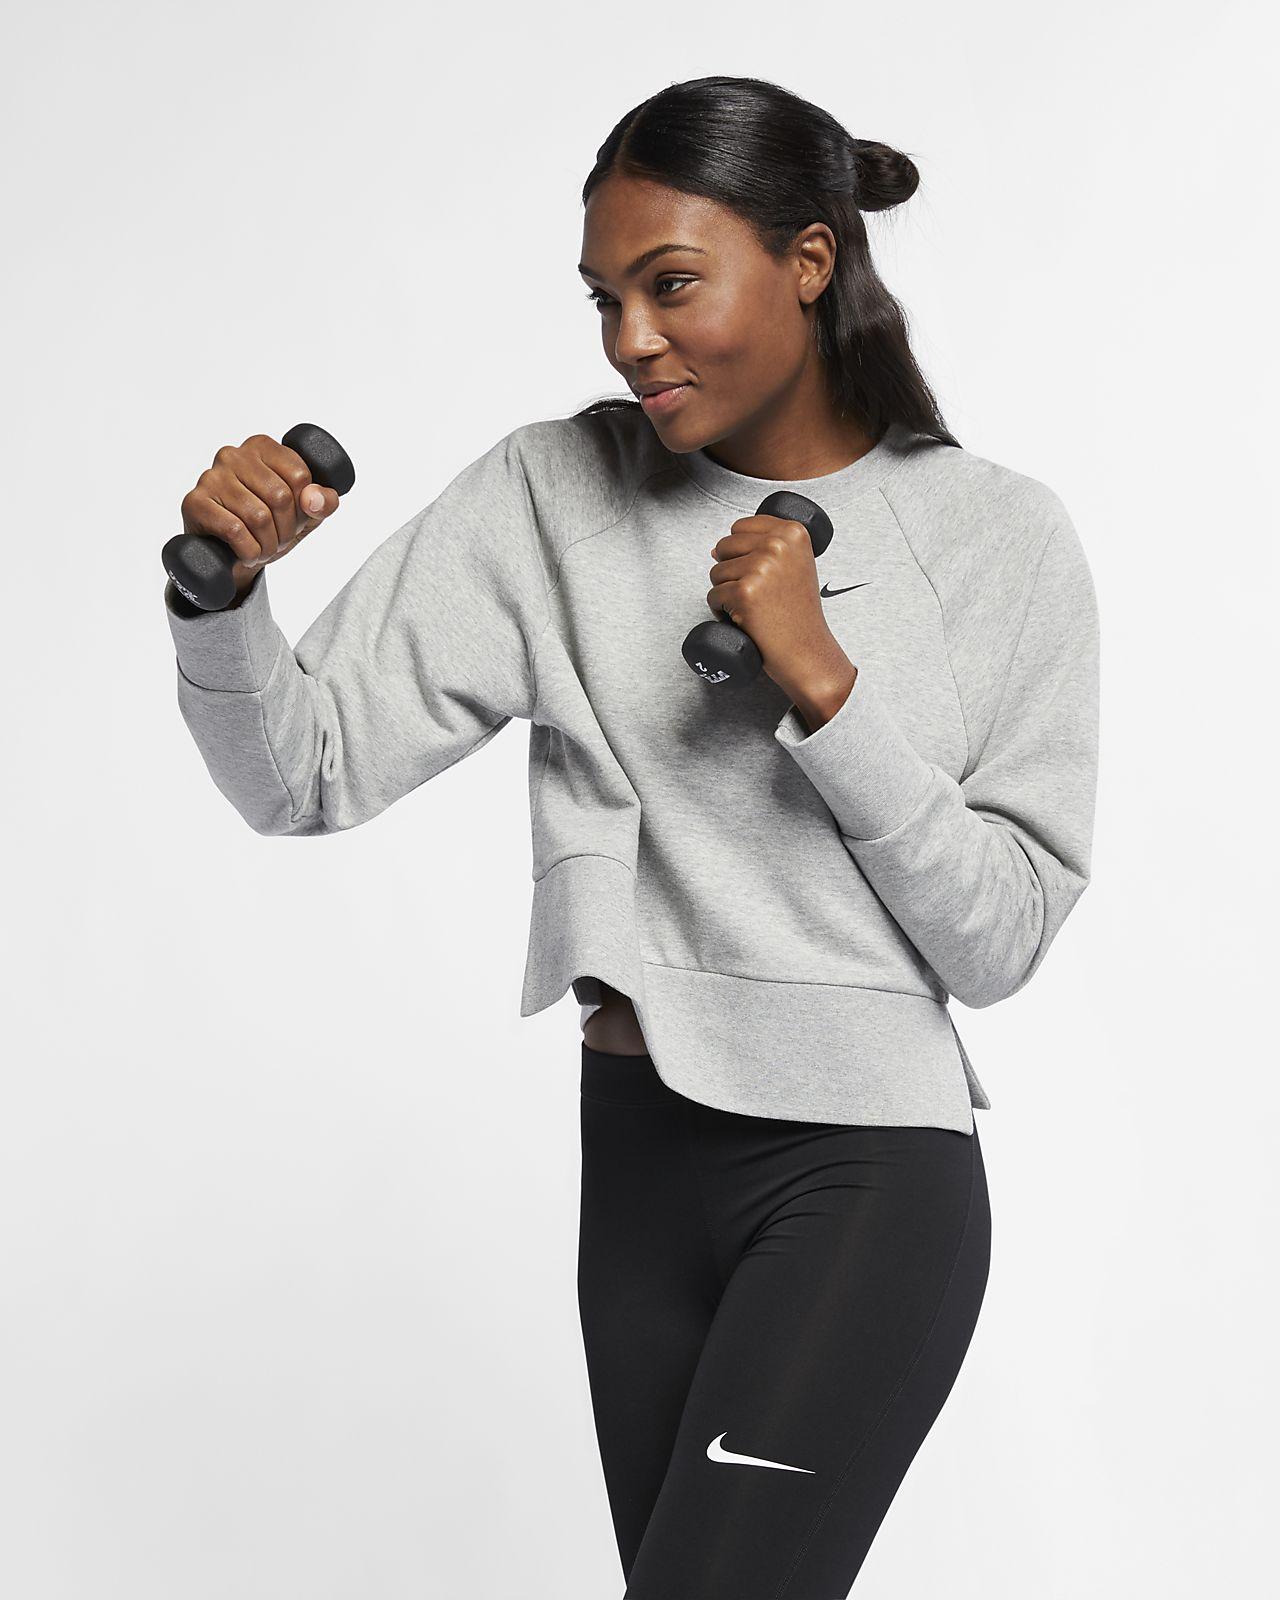 9bf574c031be6 Nike Dri-FIT Women s Long-Sleeve Training Top. Nike.com HR